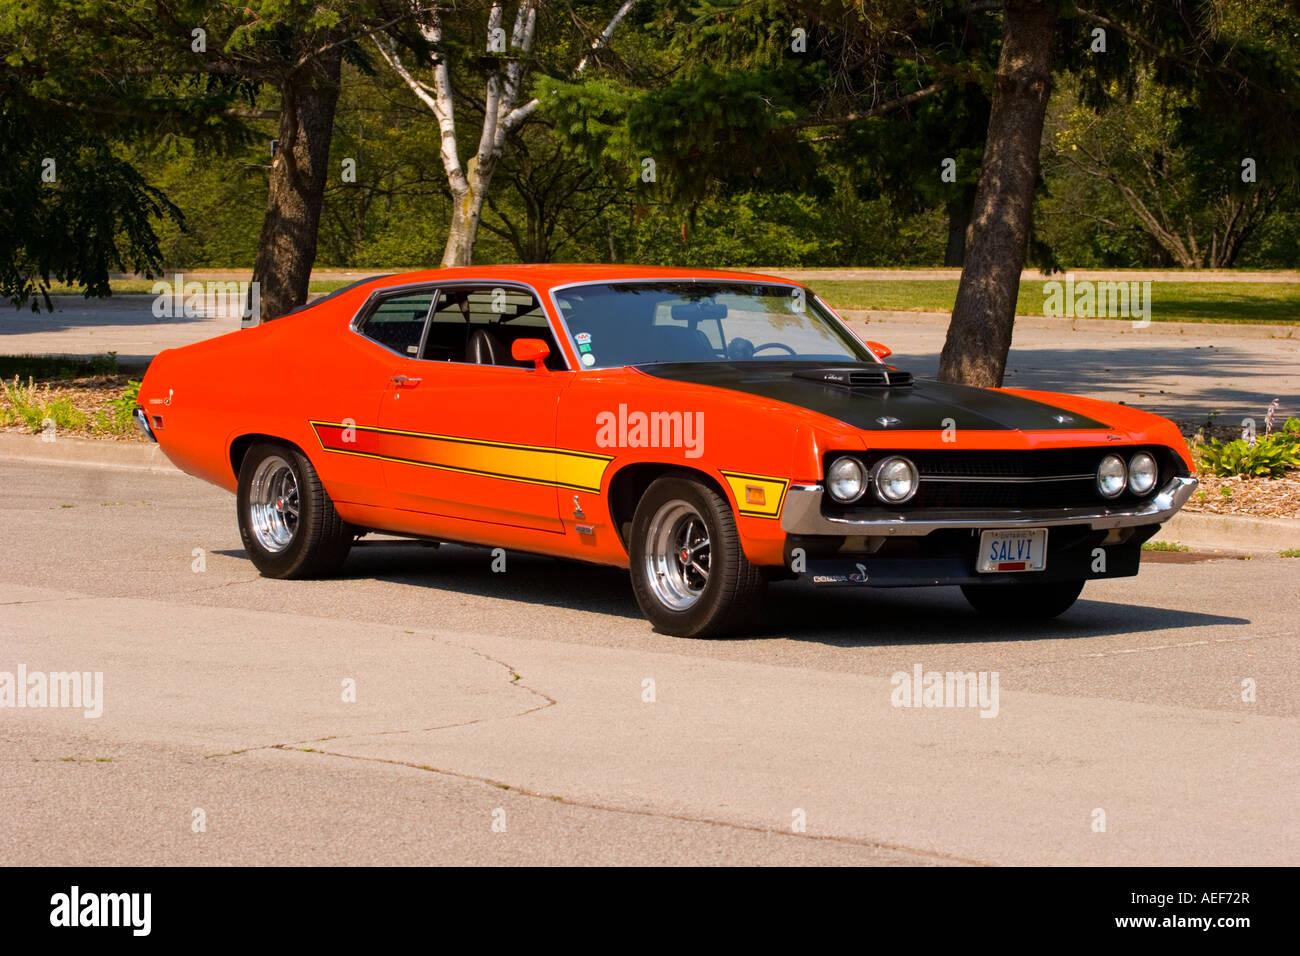 1970 Ford Torino Cobra Stock Photo: 13665934 - Alamy